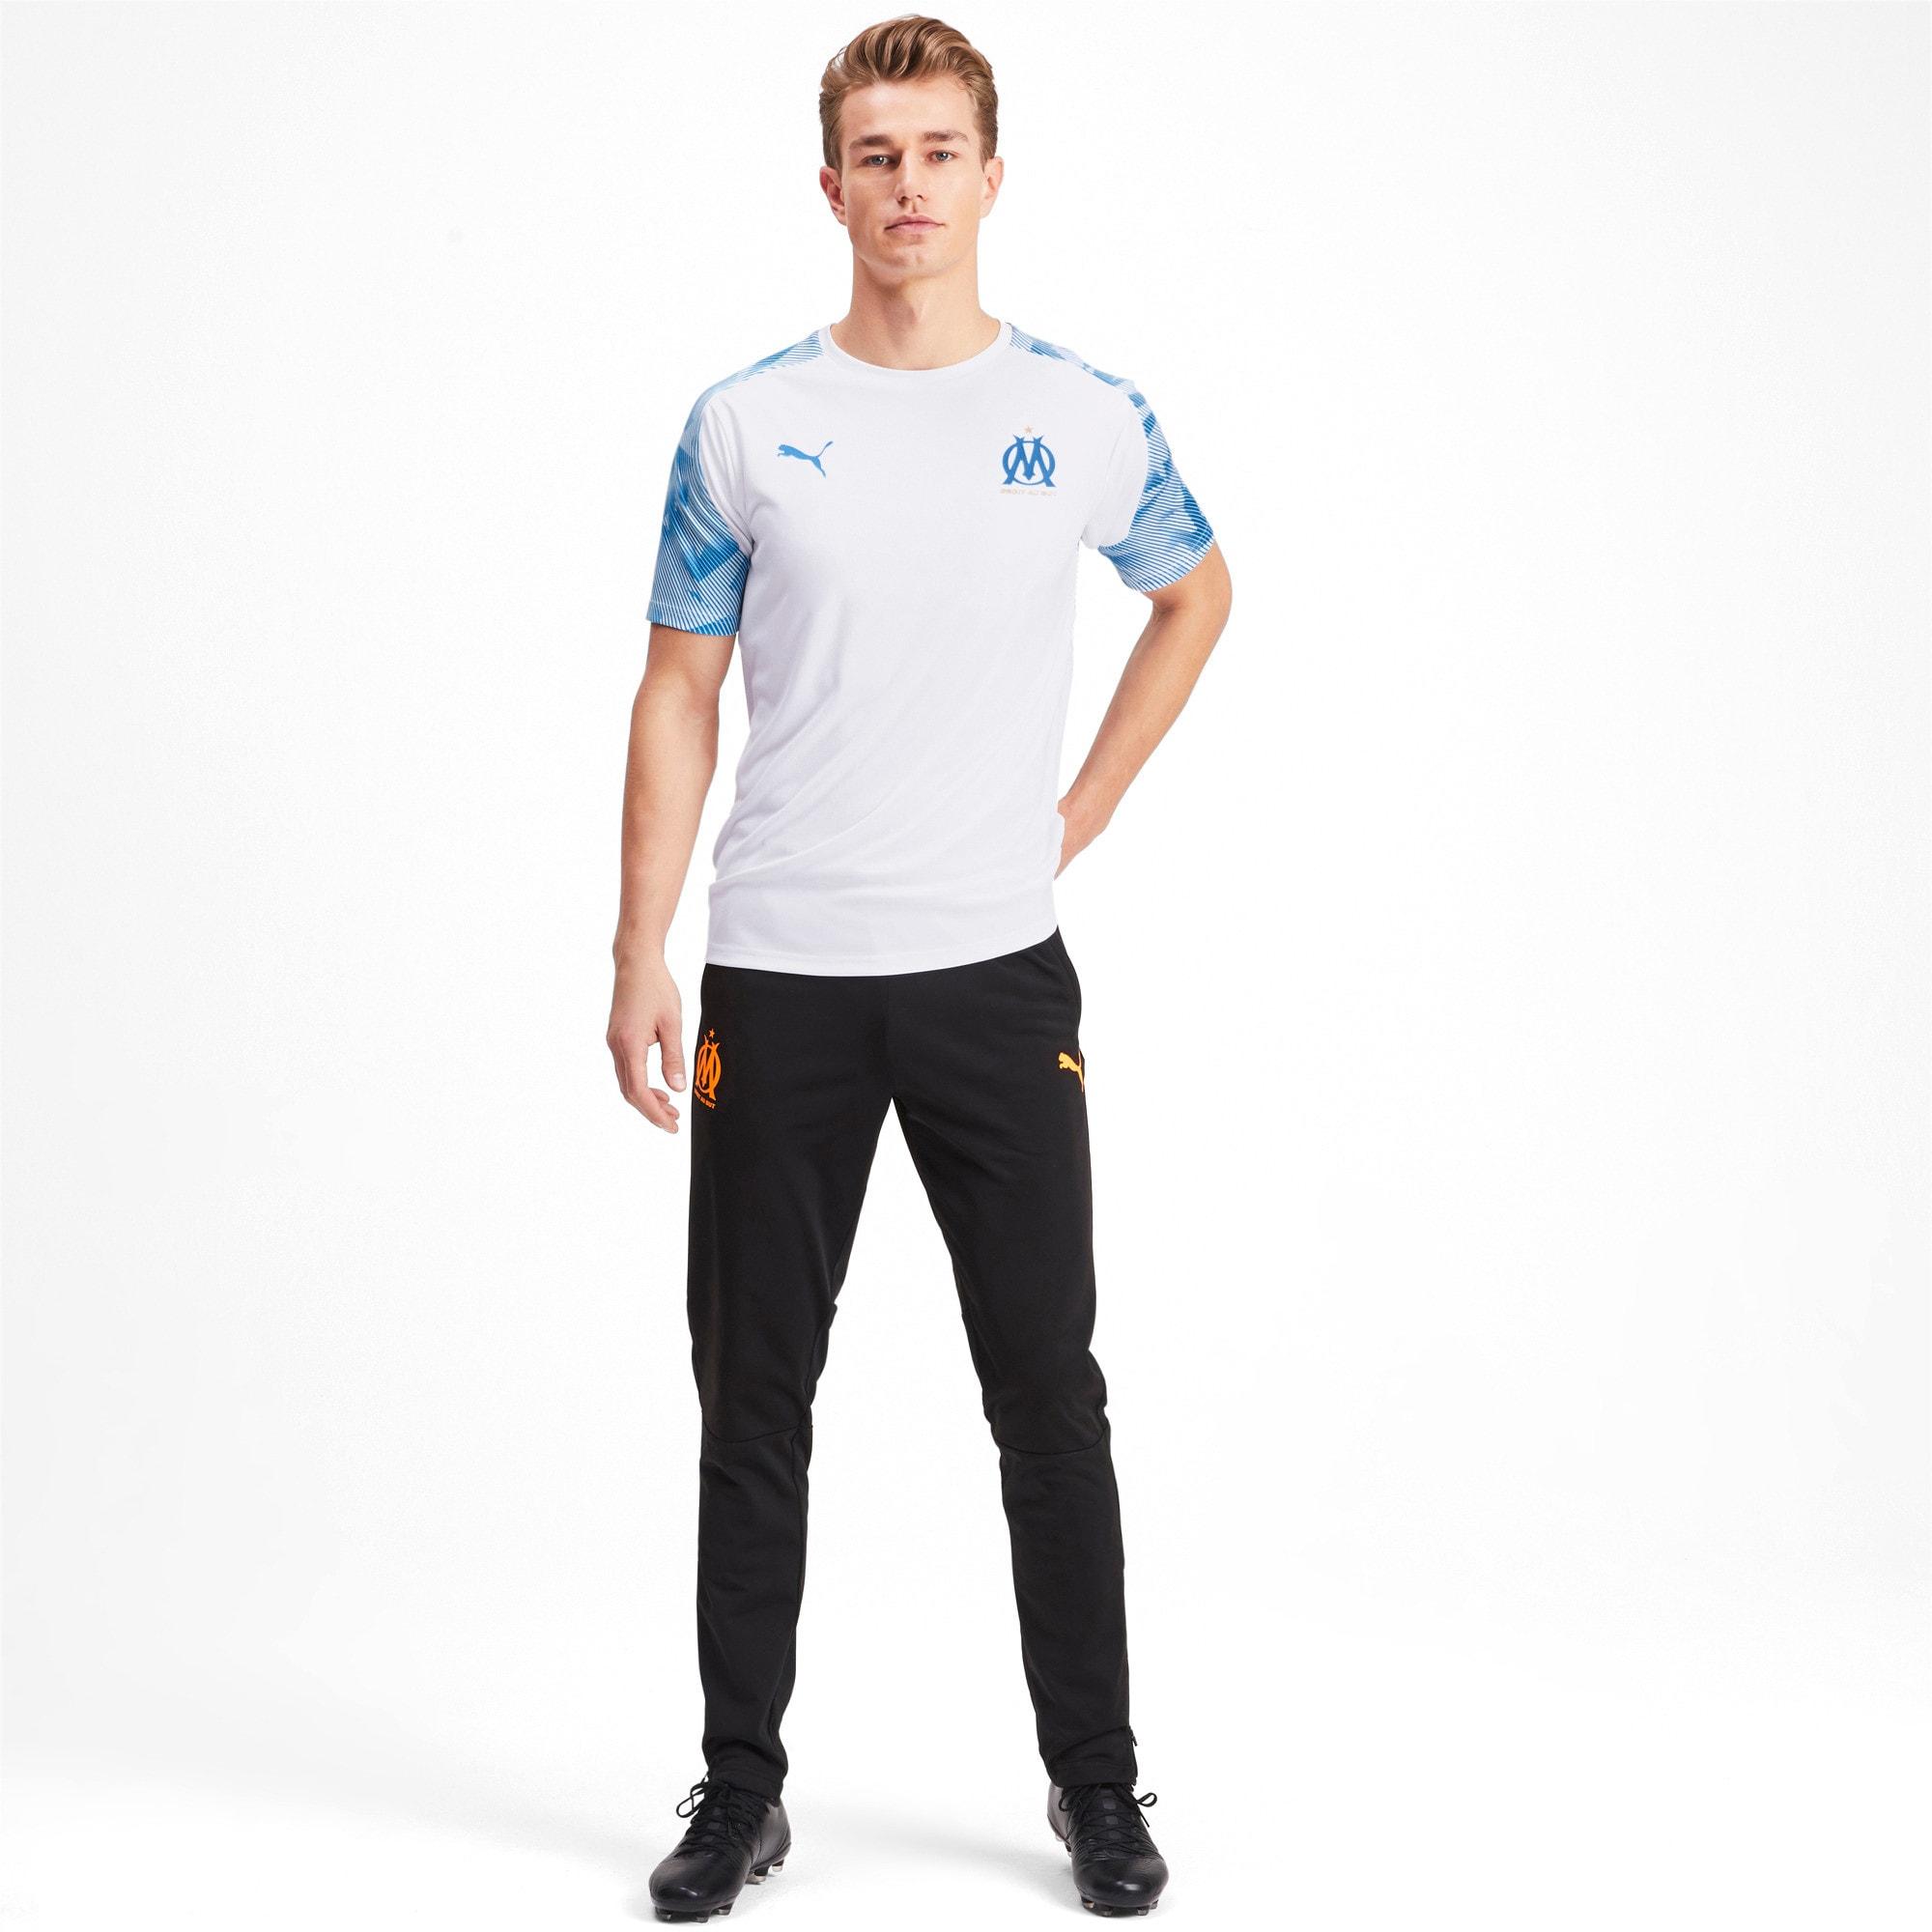 Thumbnail 3 of Olympique de Marseille Herren Trainingstrikot, Puma White-Bleu Azur, medium